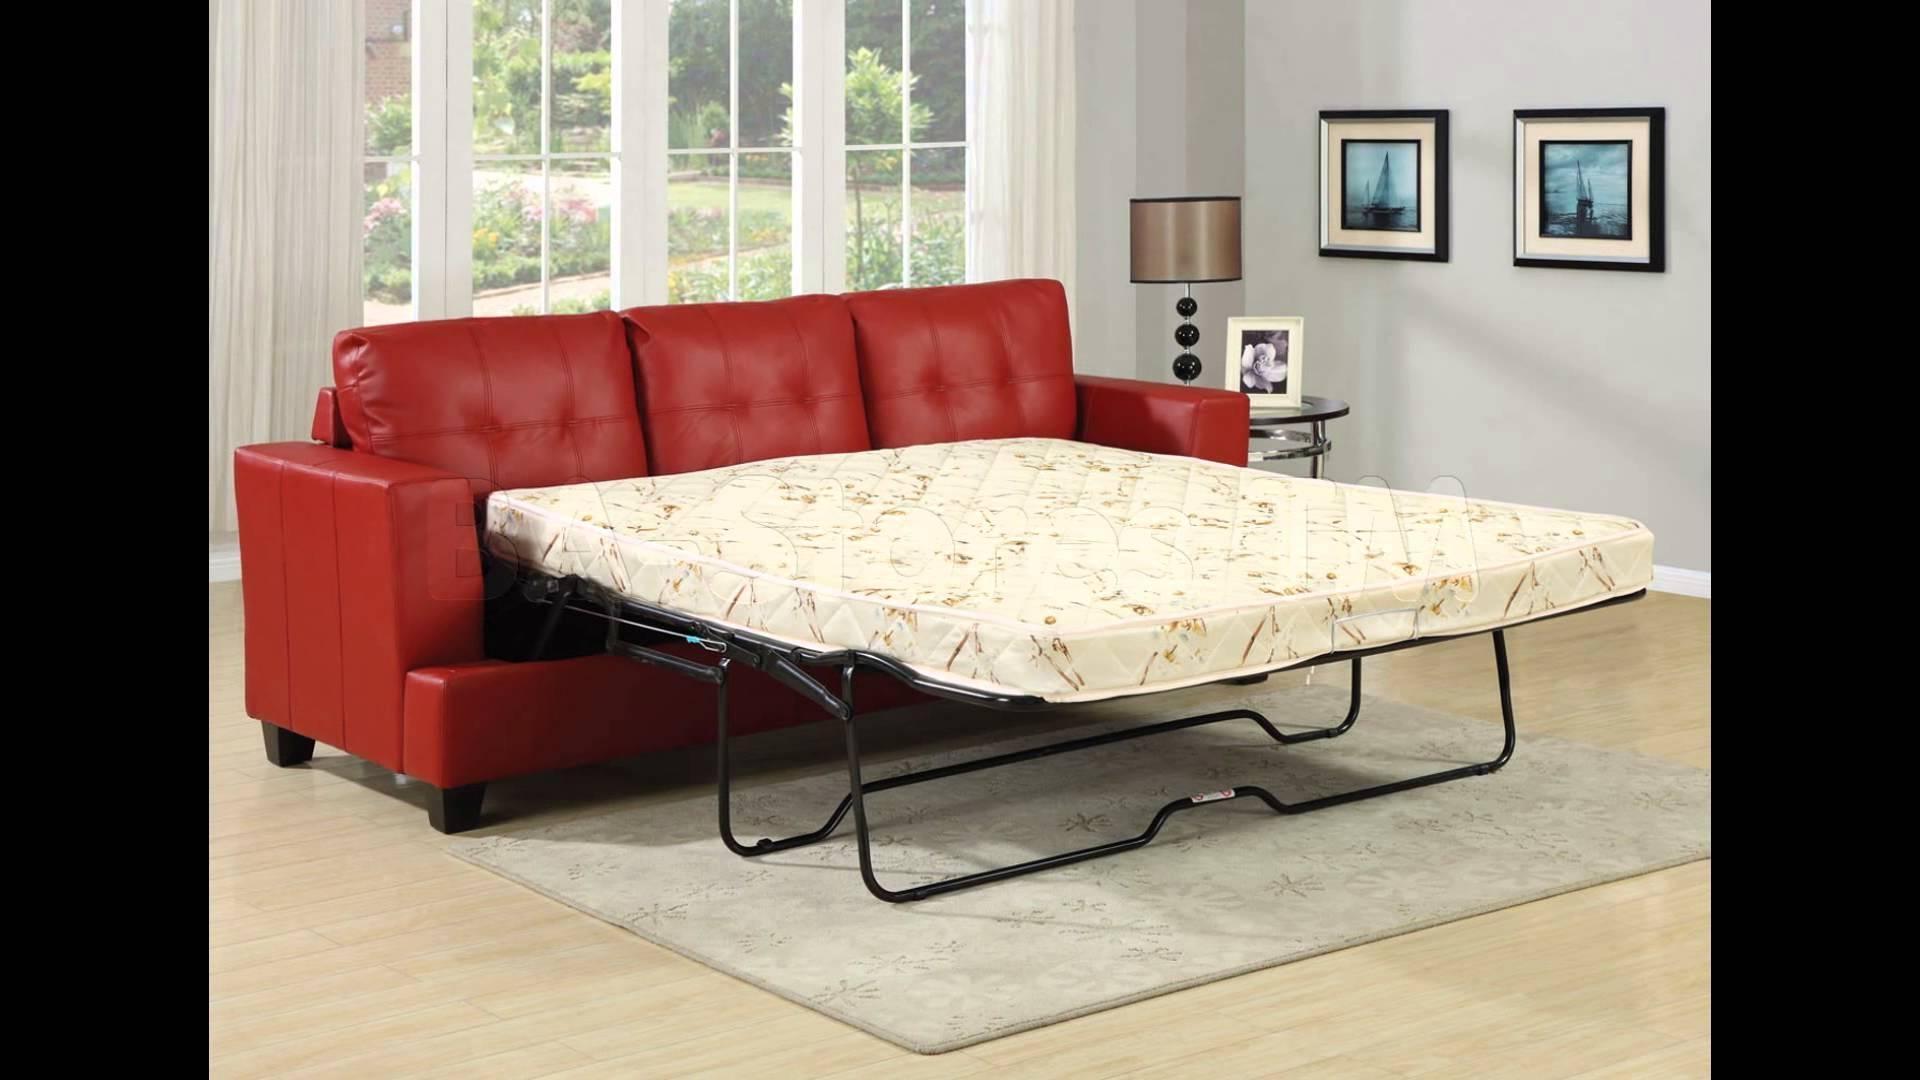 Sleeper Sofa | Sofa Sleeper | Sectional Sleeper Sofa – Youtube Regarding Red Sectional Sleeper Sofas (Image 14 of 22)